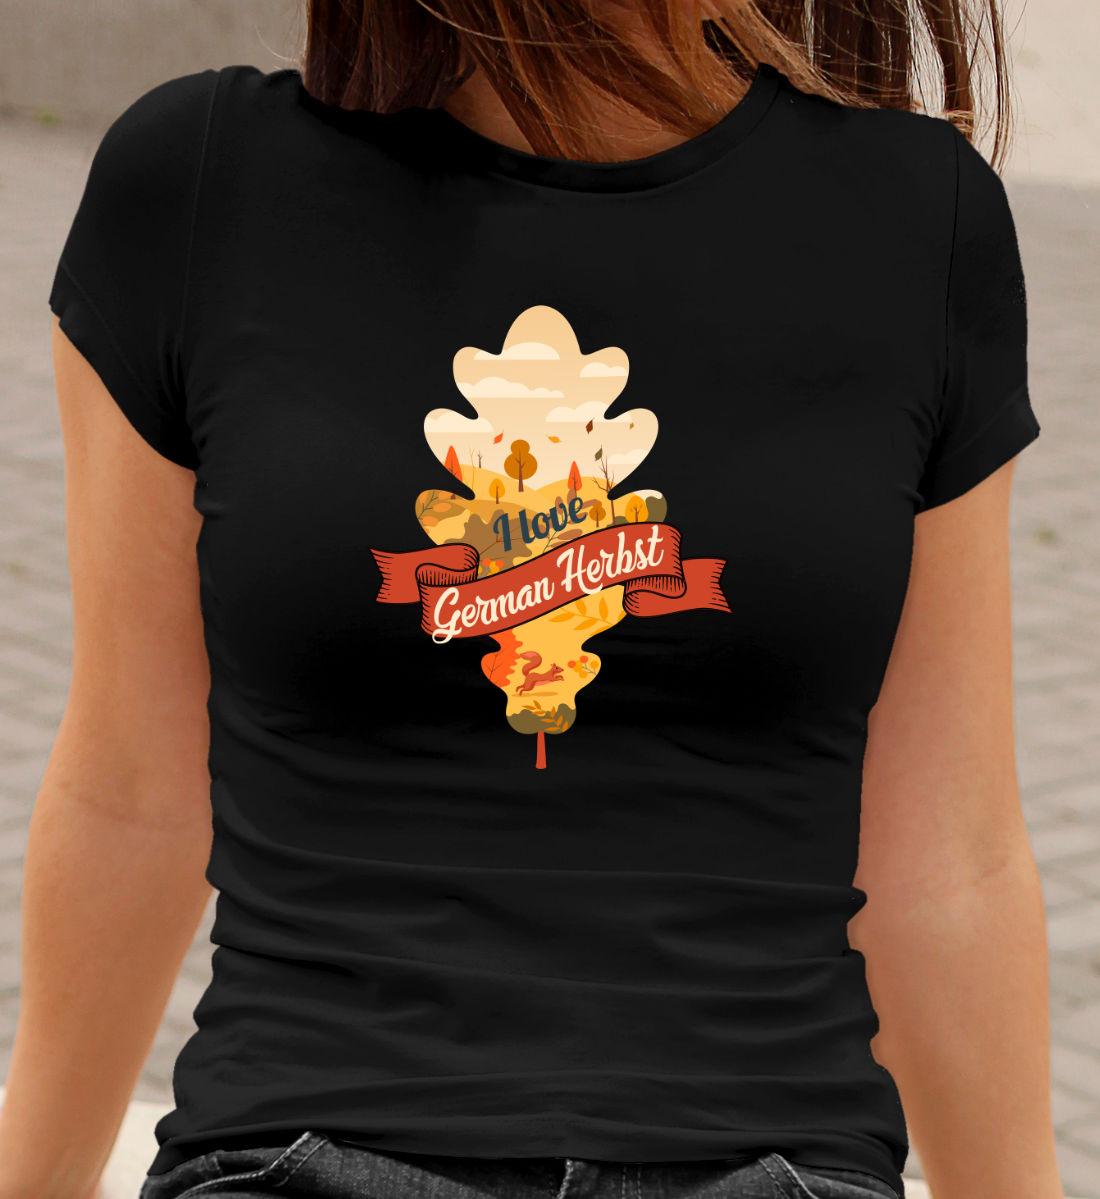 Wandern T-Shirt German Herbst Eichenblatt